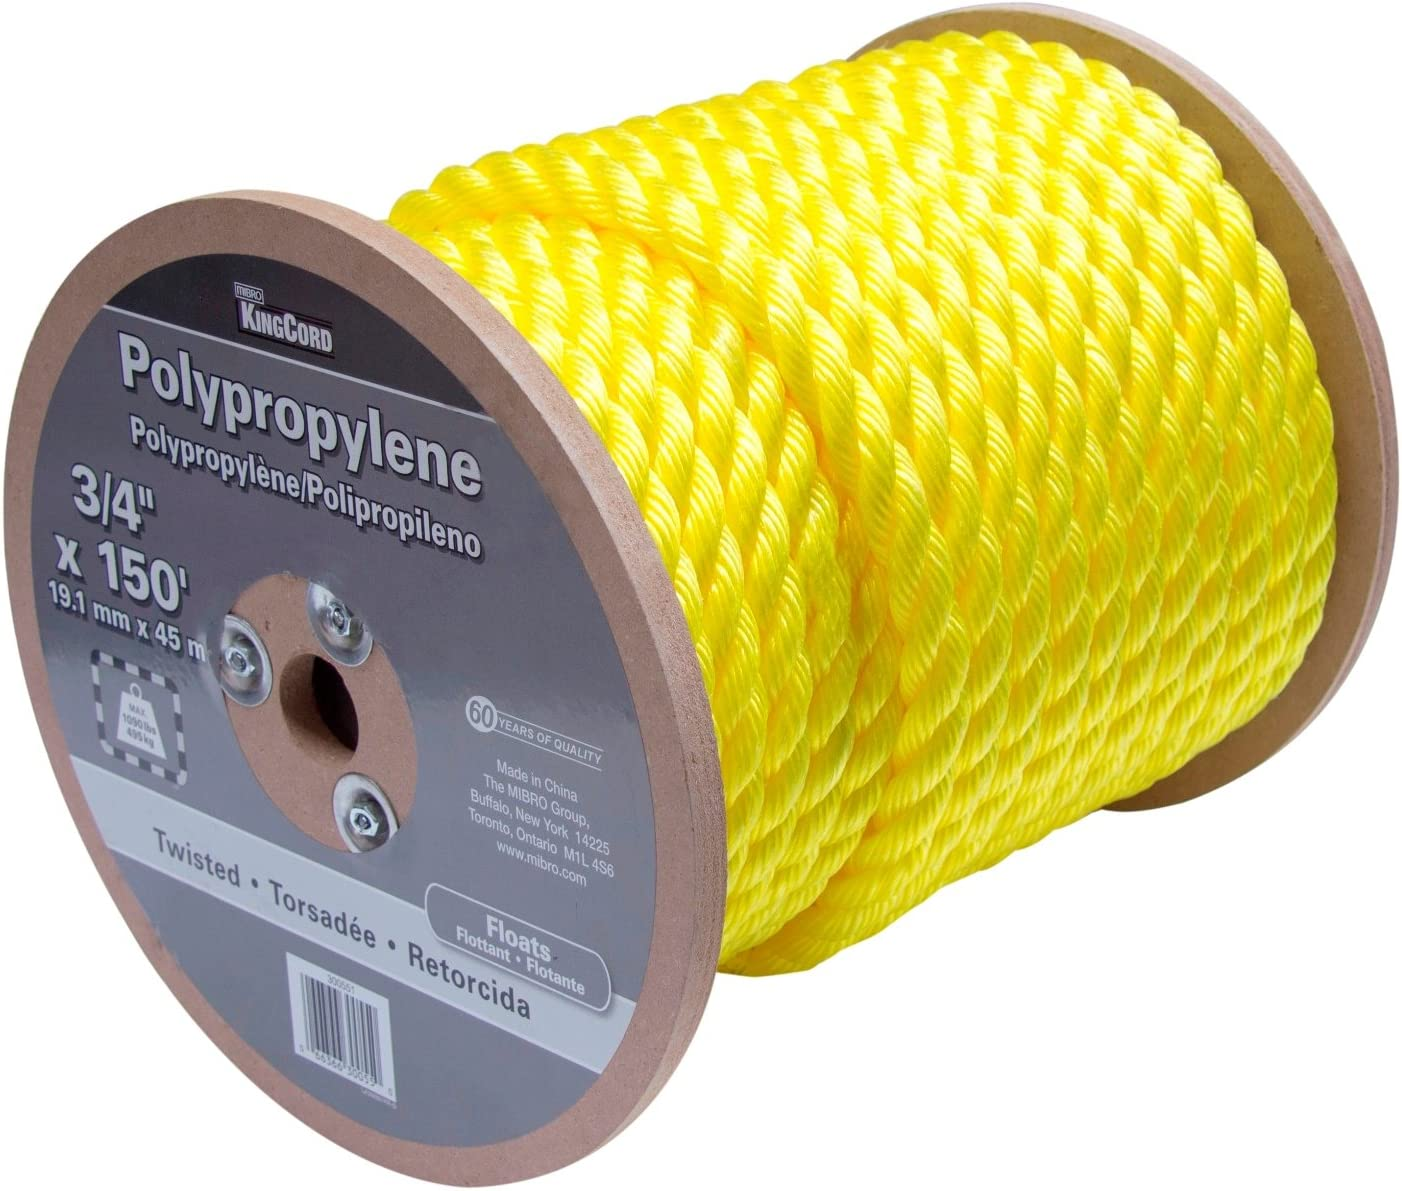 "KingCord 300551 Polypropylene Twisted Rope Reel 3/4"" x 150', Yellow"